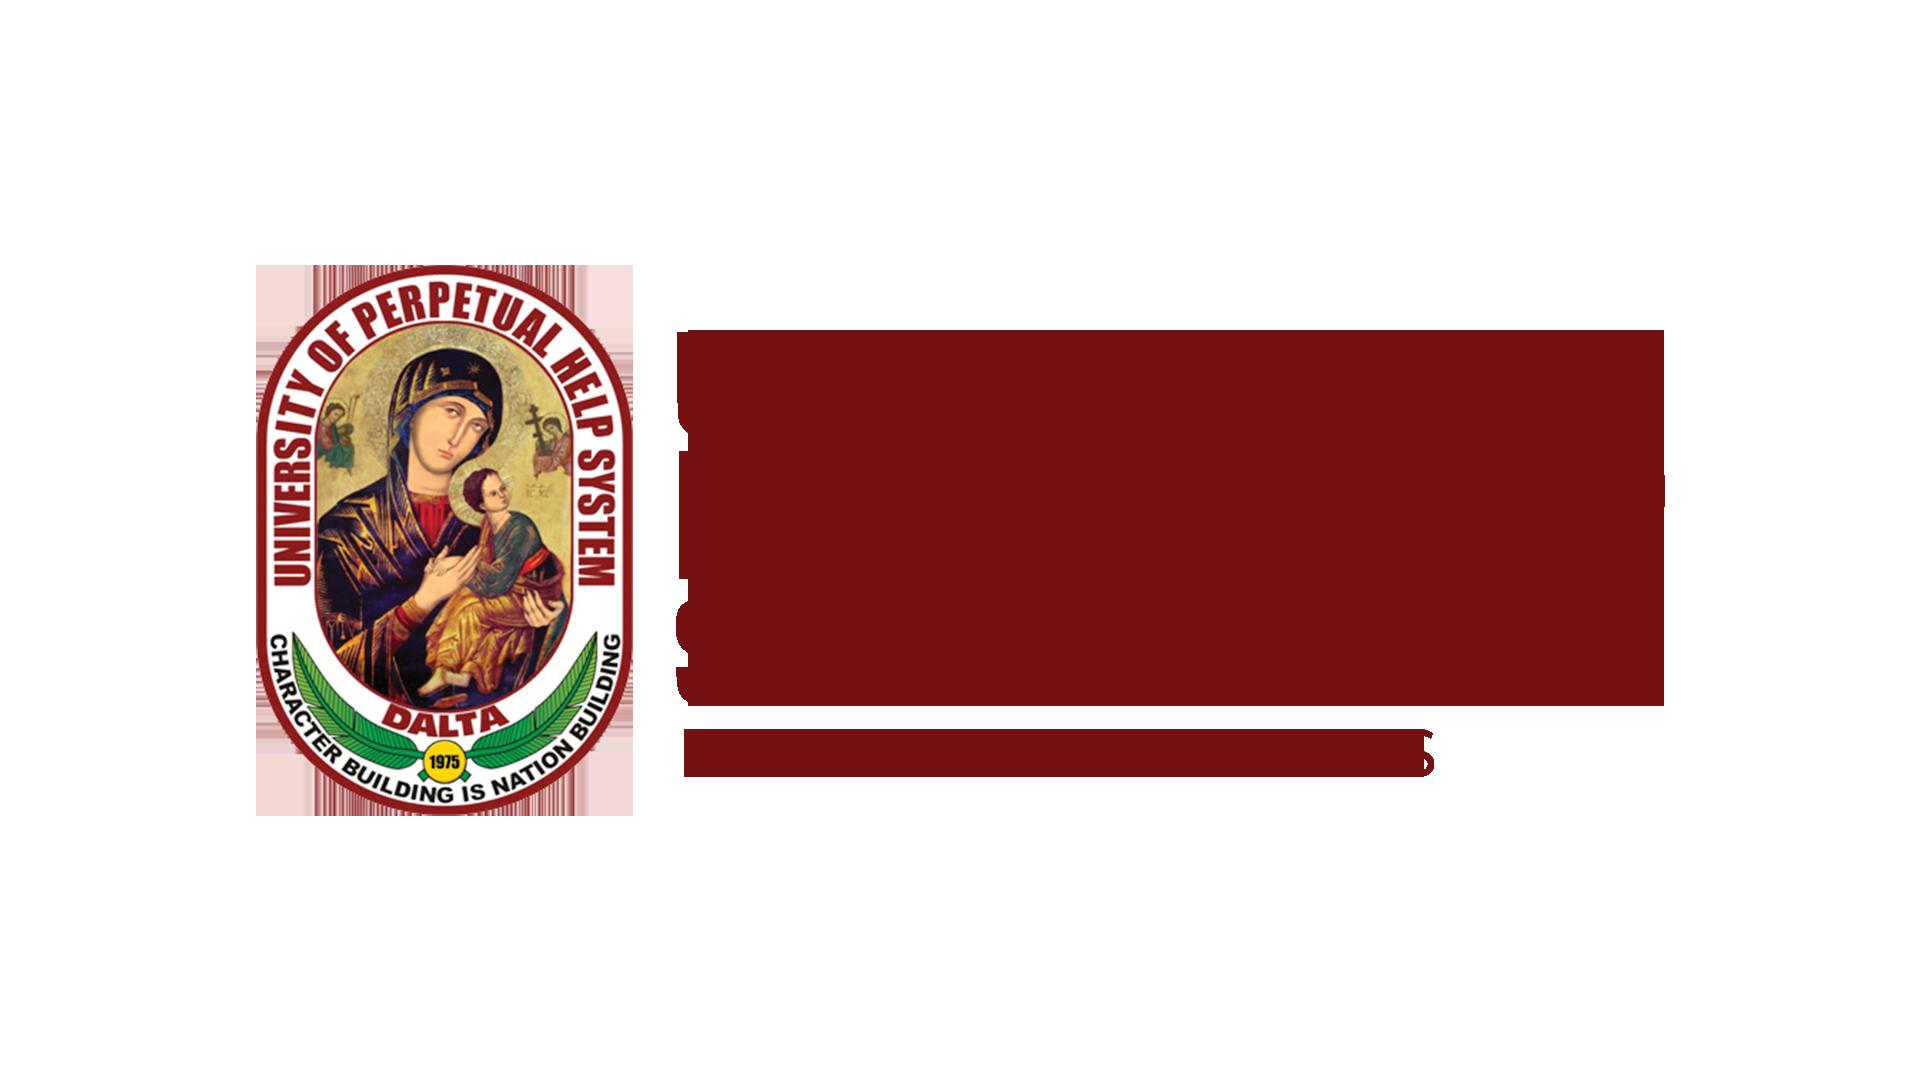 Top Universities For Mbbs Study In Philippines In 2020 Studying Medicine Christian College School Of Medicine